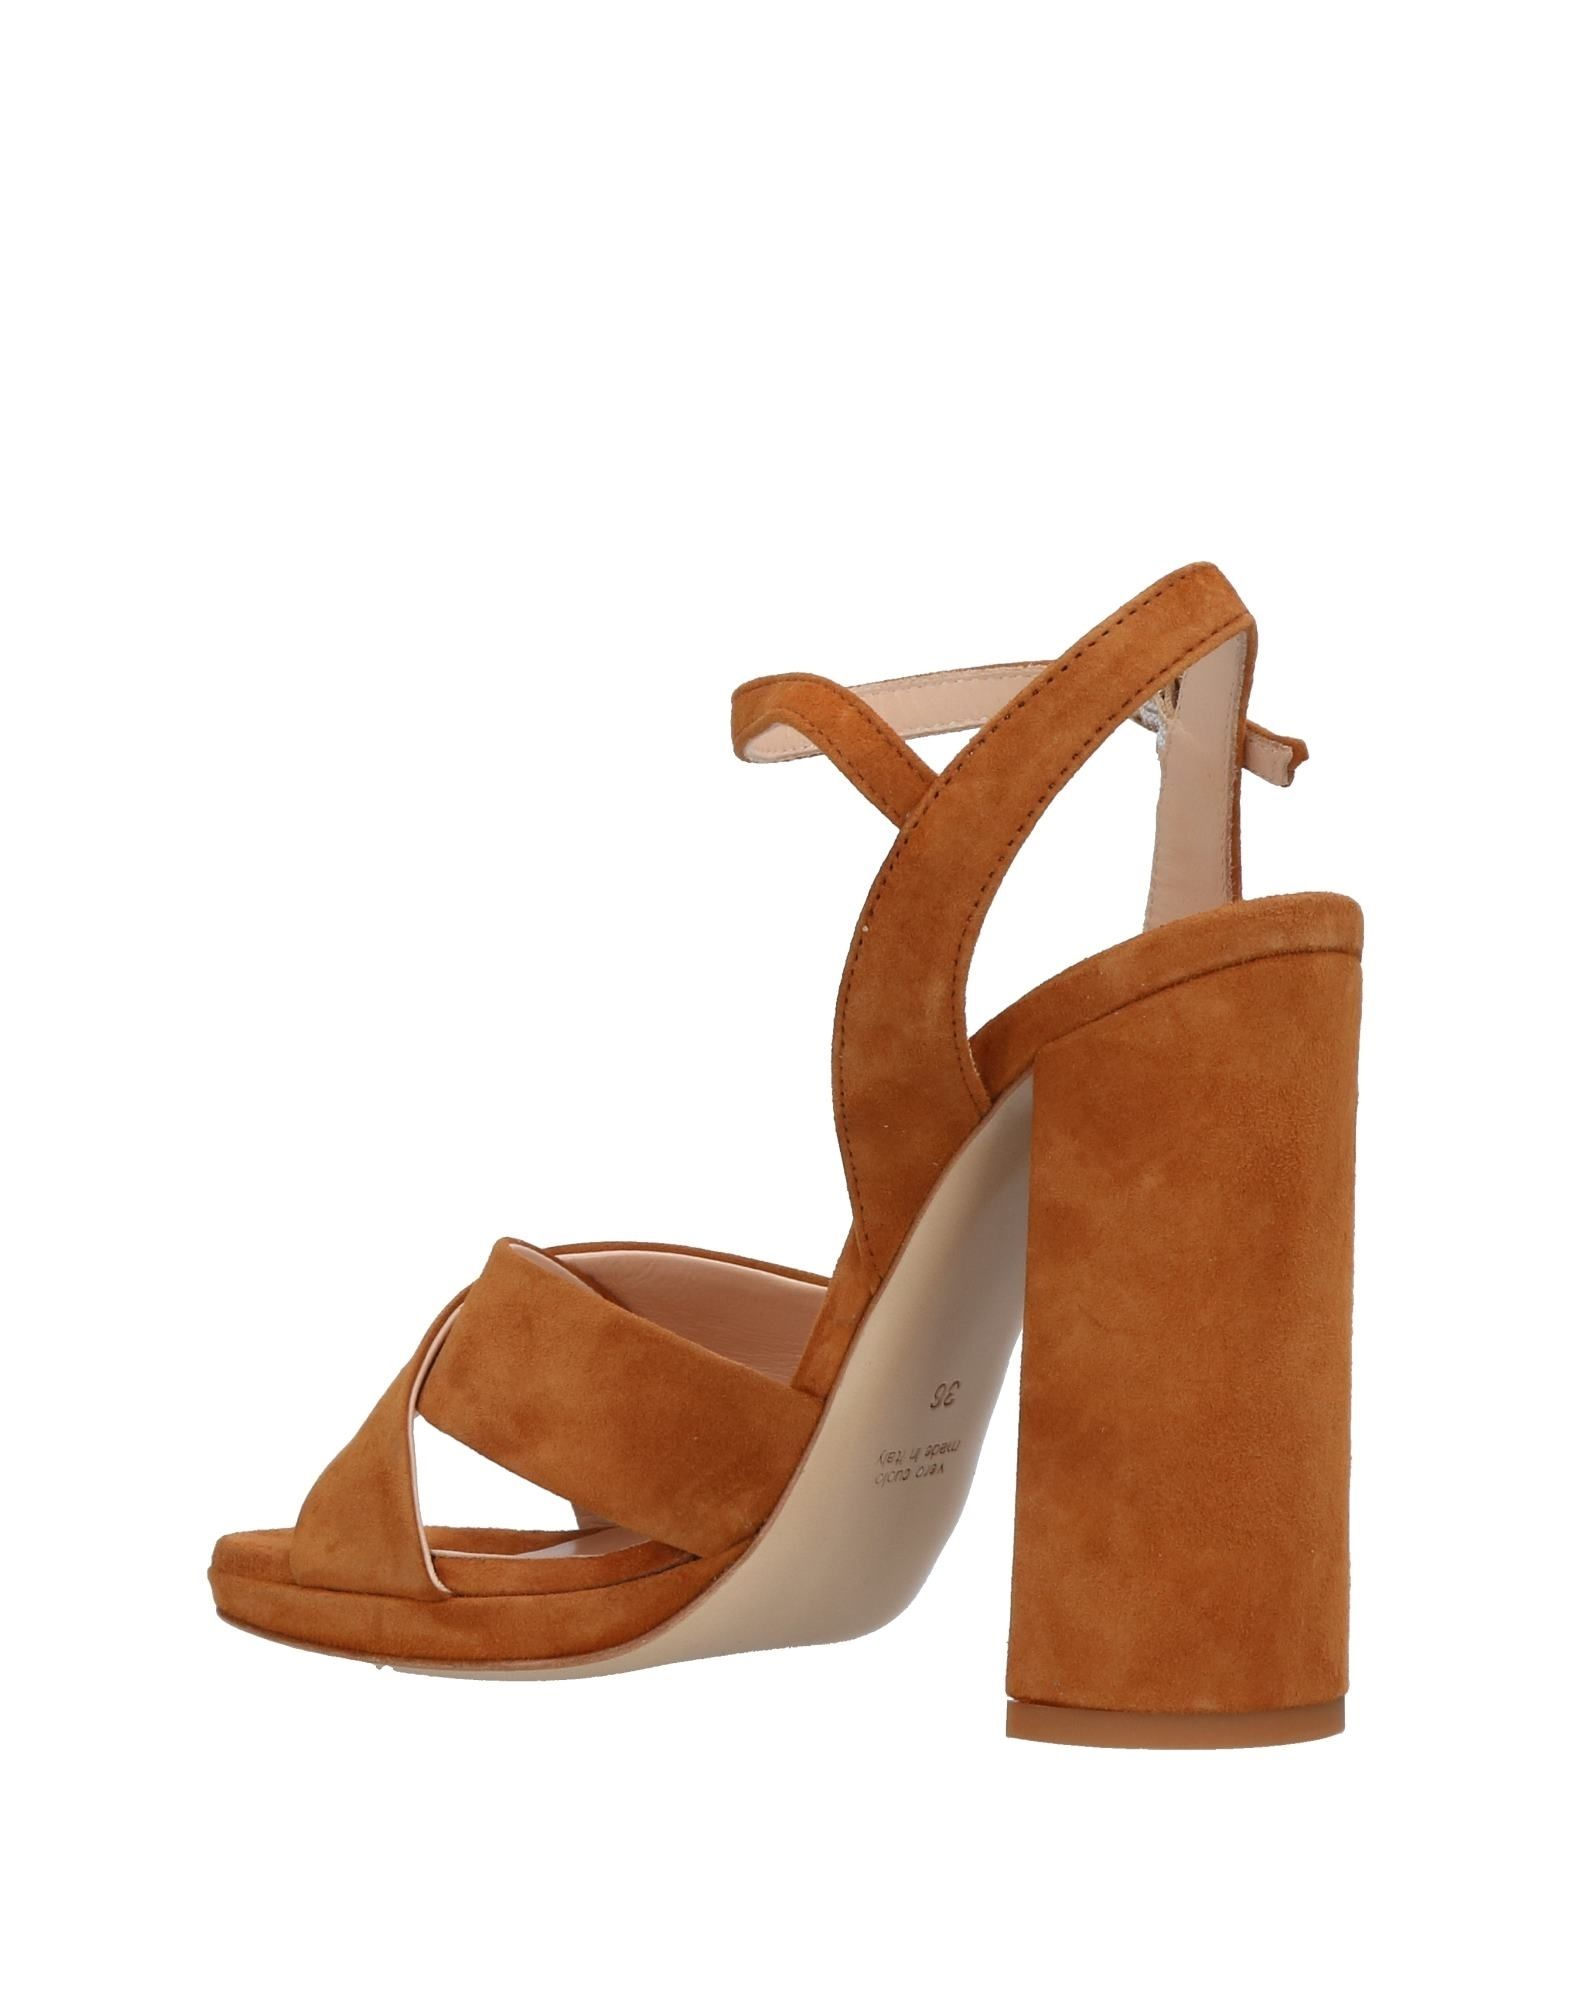 Giampaolo Viozzi Sandalen Damen  11379632KS Gute Qualität beliebte Schuhe